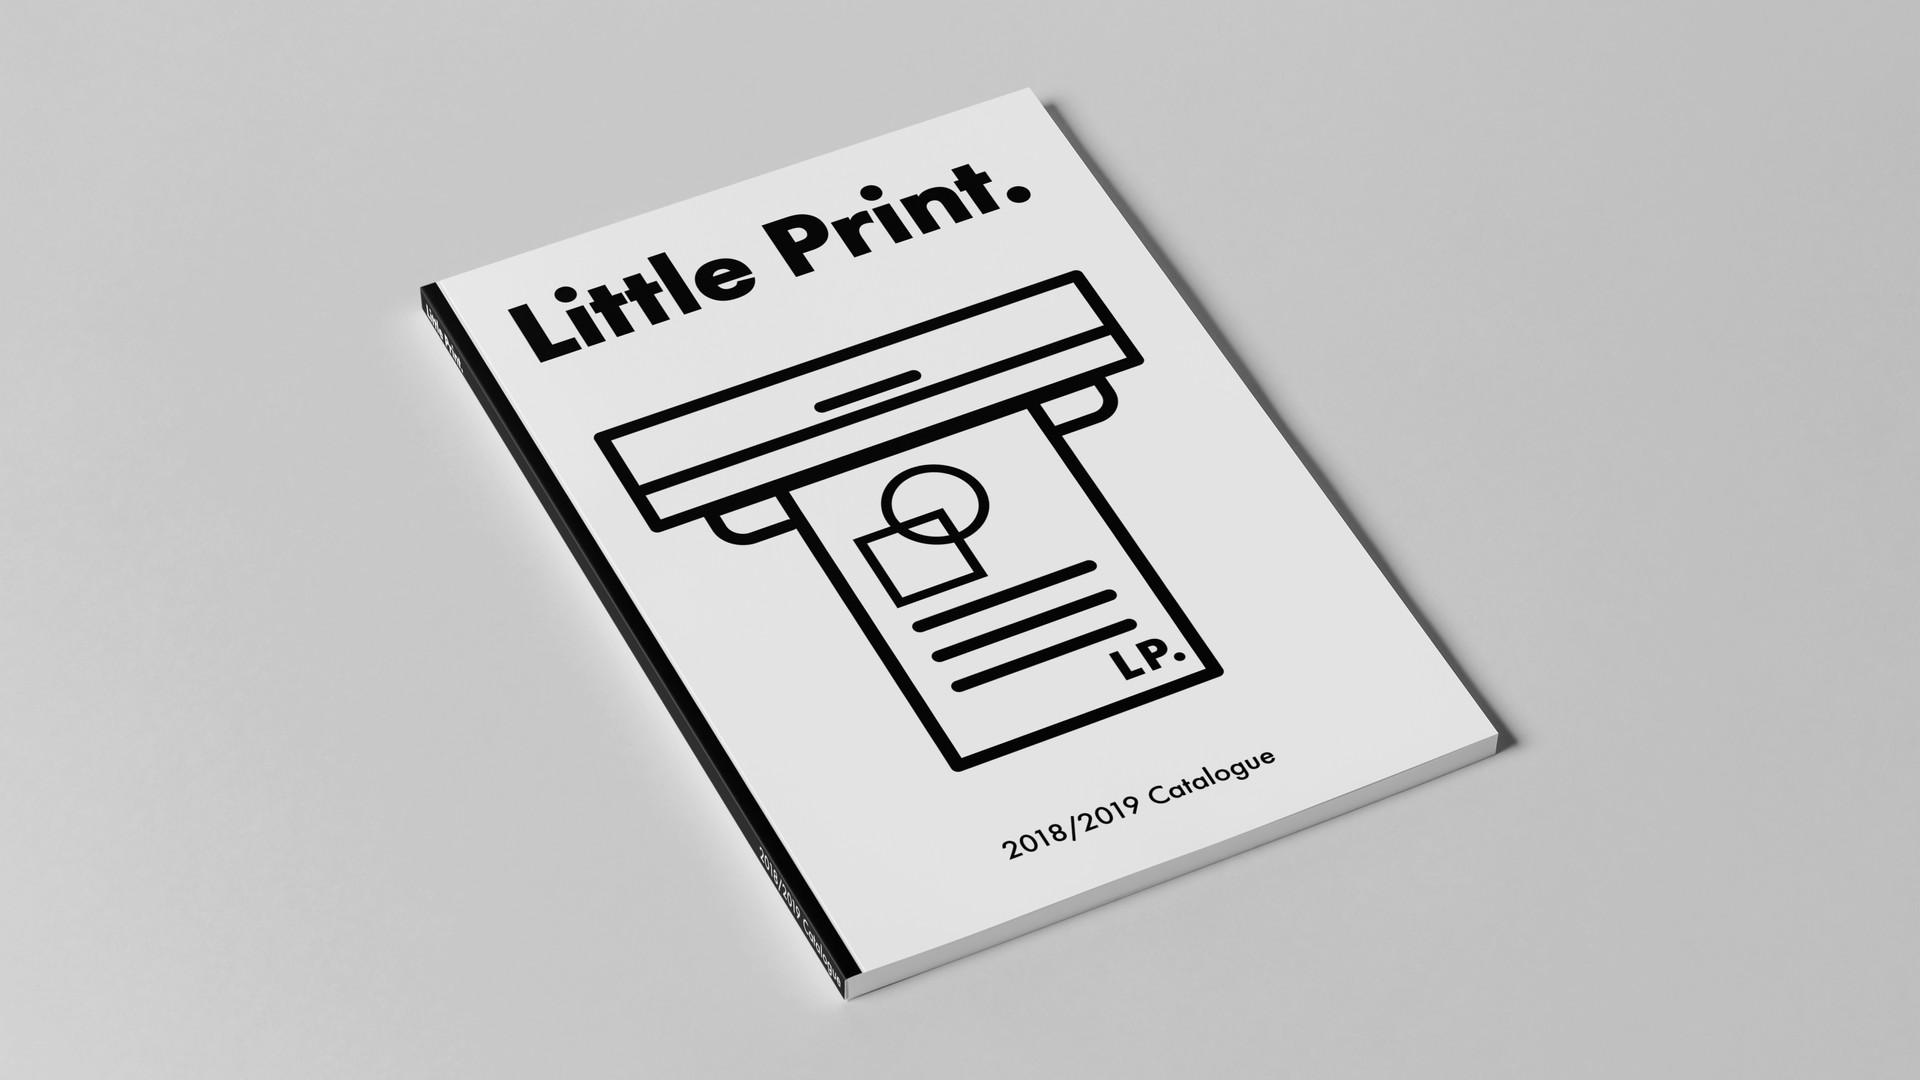 Littleprint_perfectbound_portrait_cover.